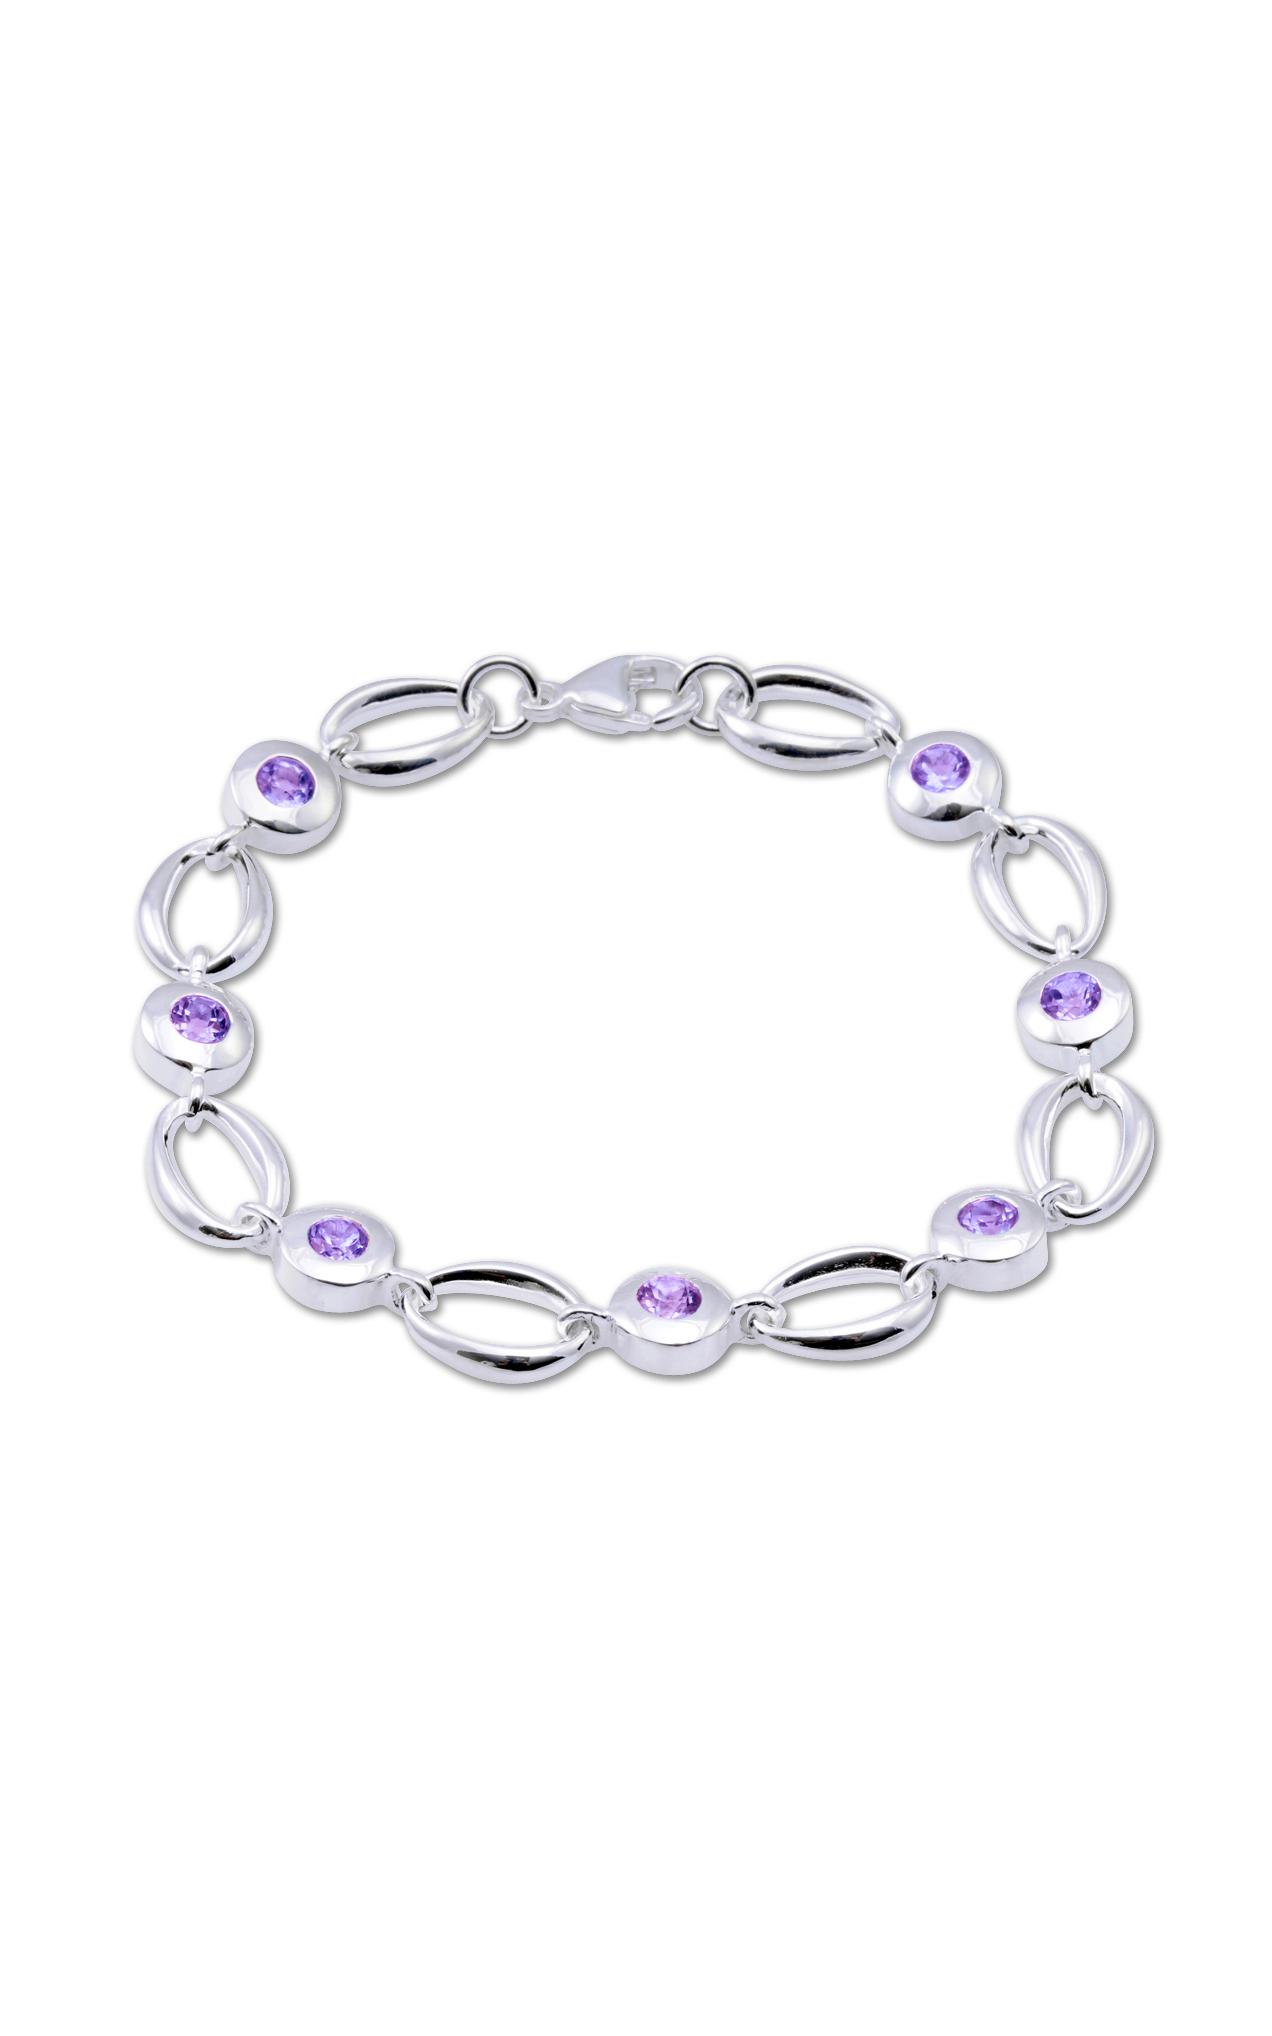 Zina Contemporary Bracelet A325-7-A product image